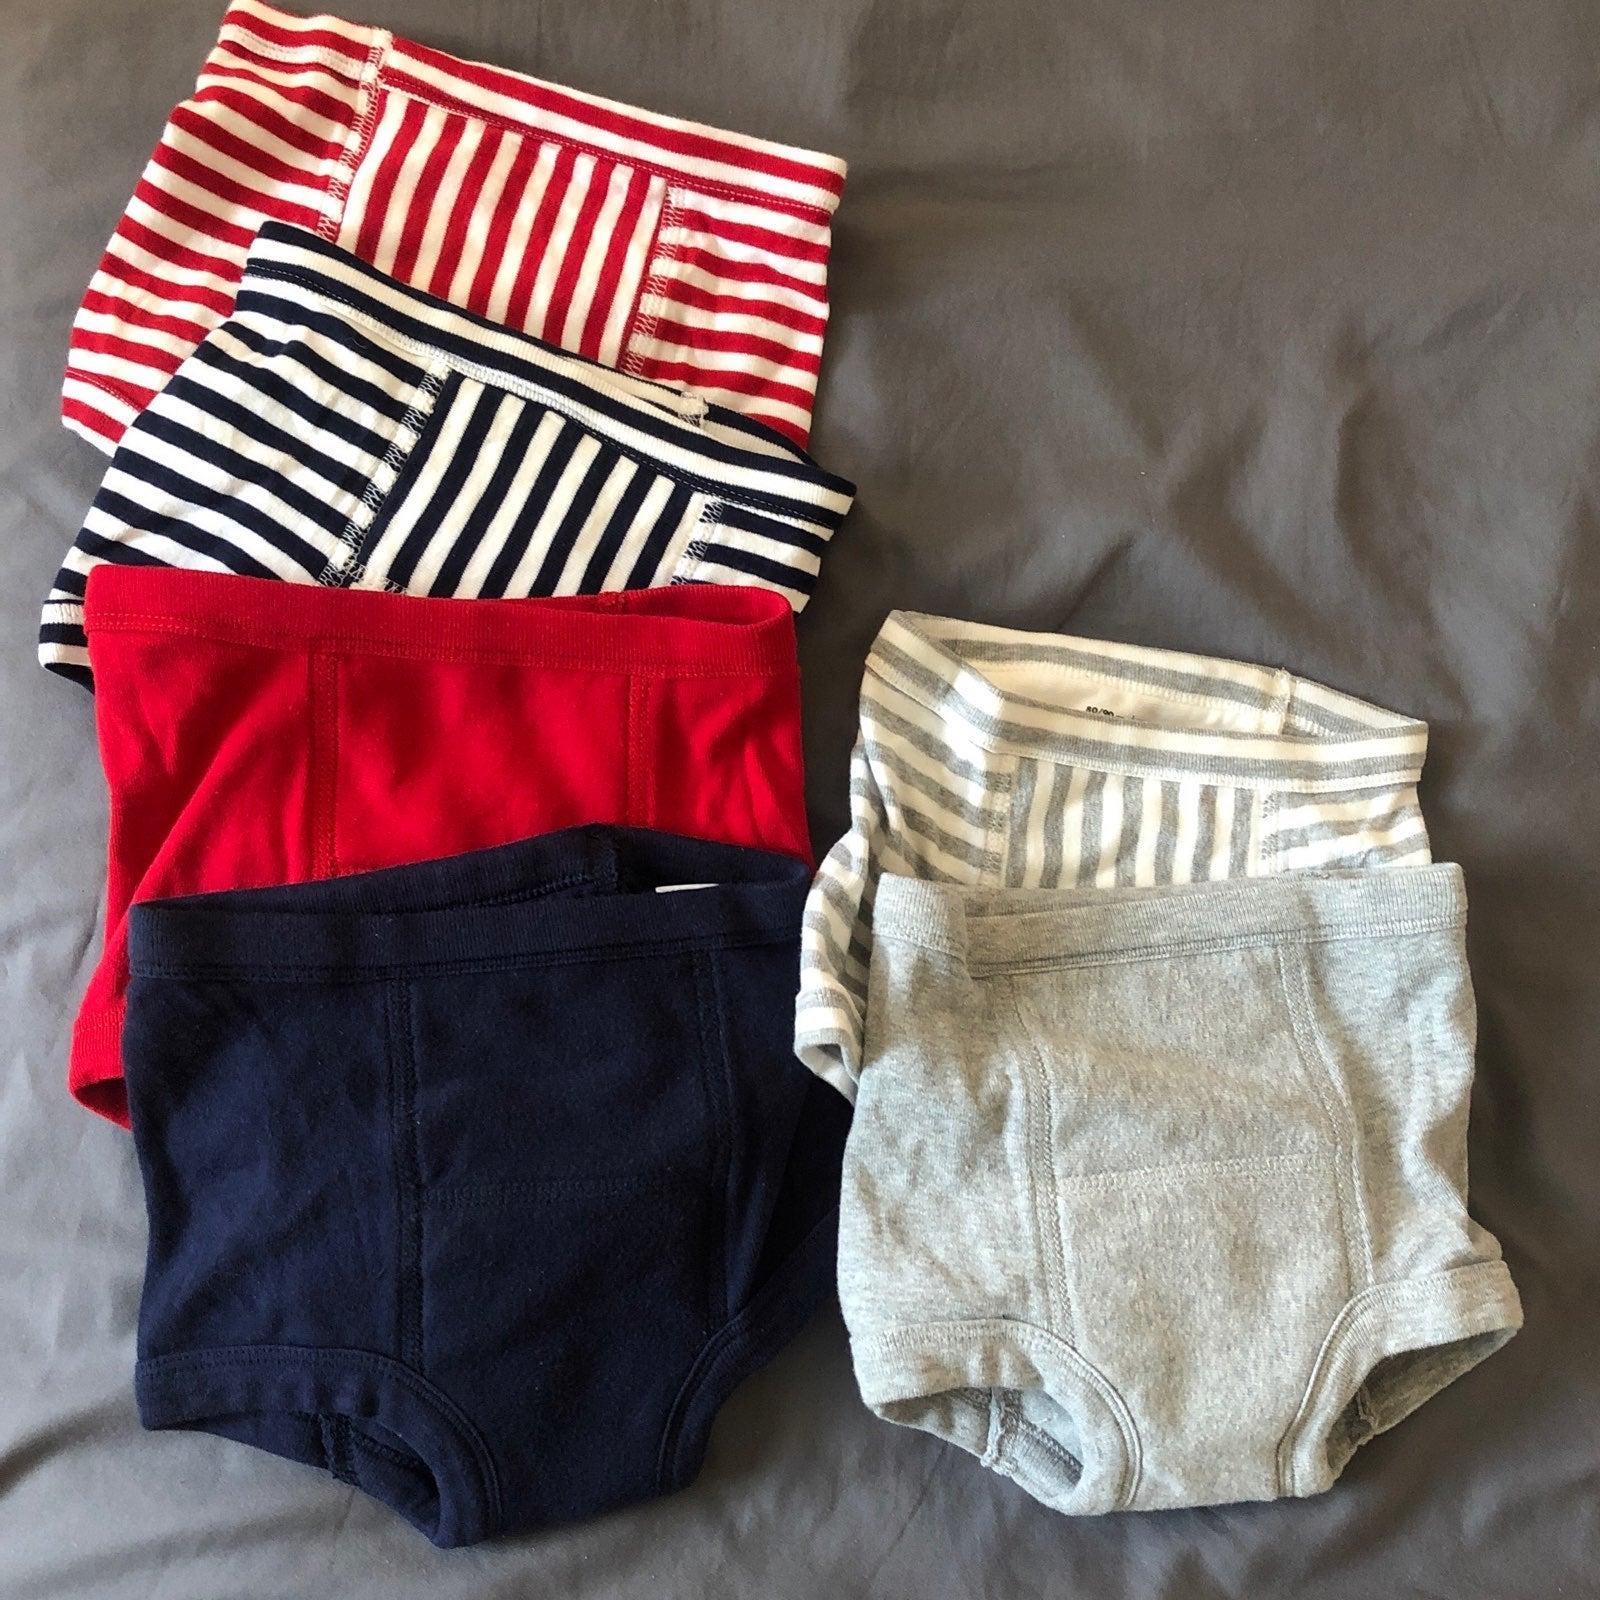 Hanna anderson toddler traning underwear